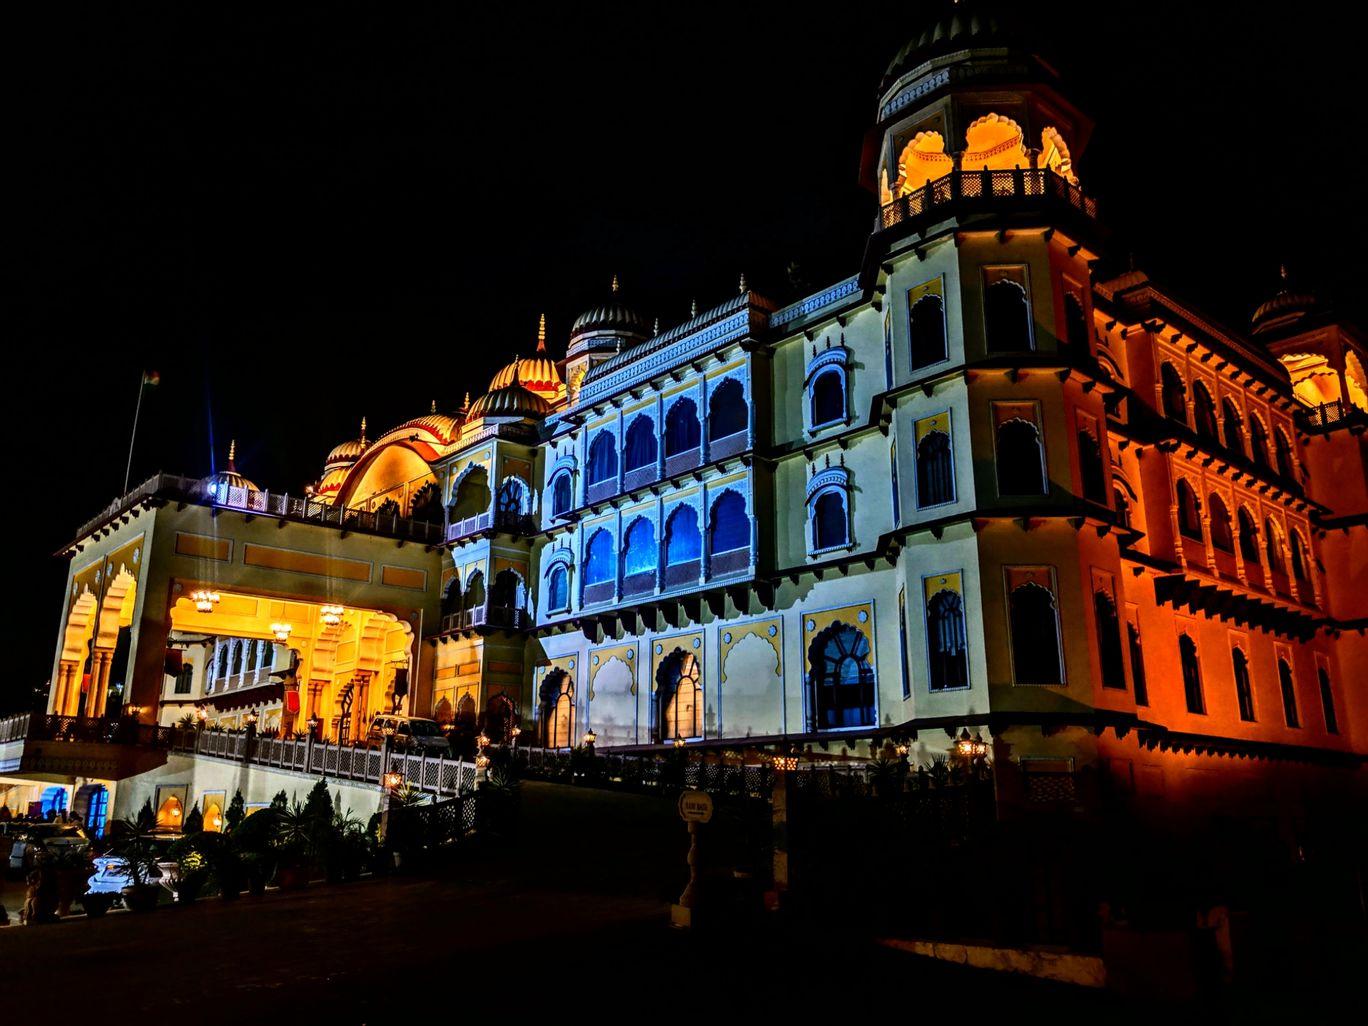 Photo of Noor Mahal Hotel By Tej Choudhary